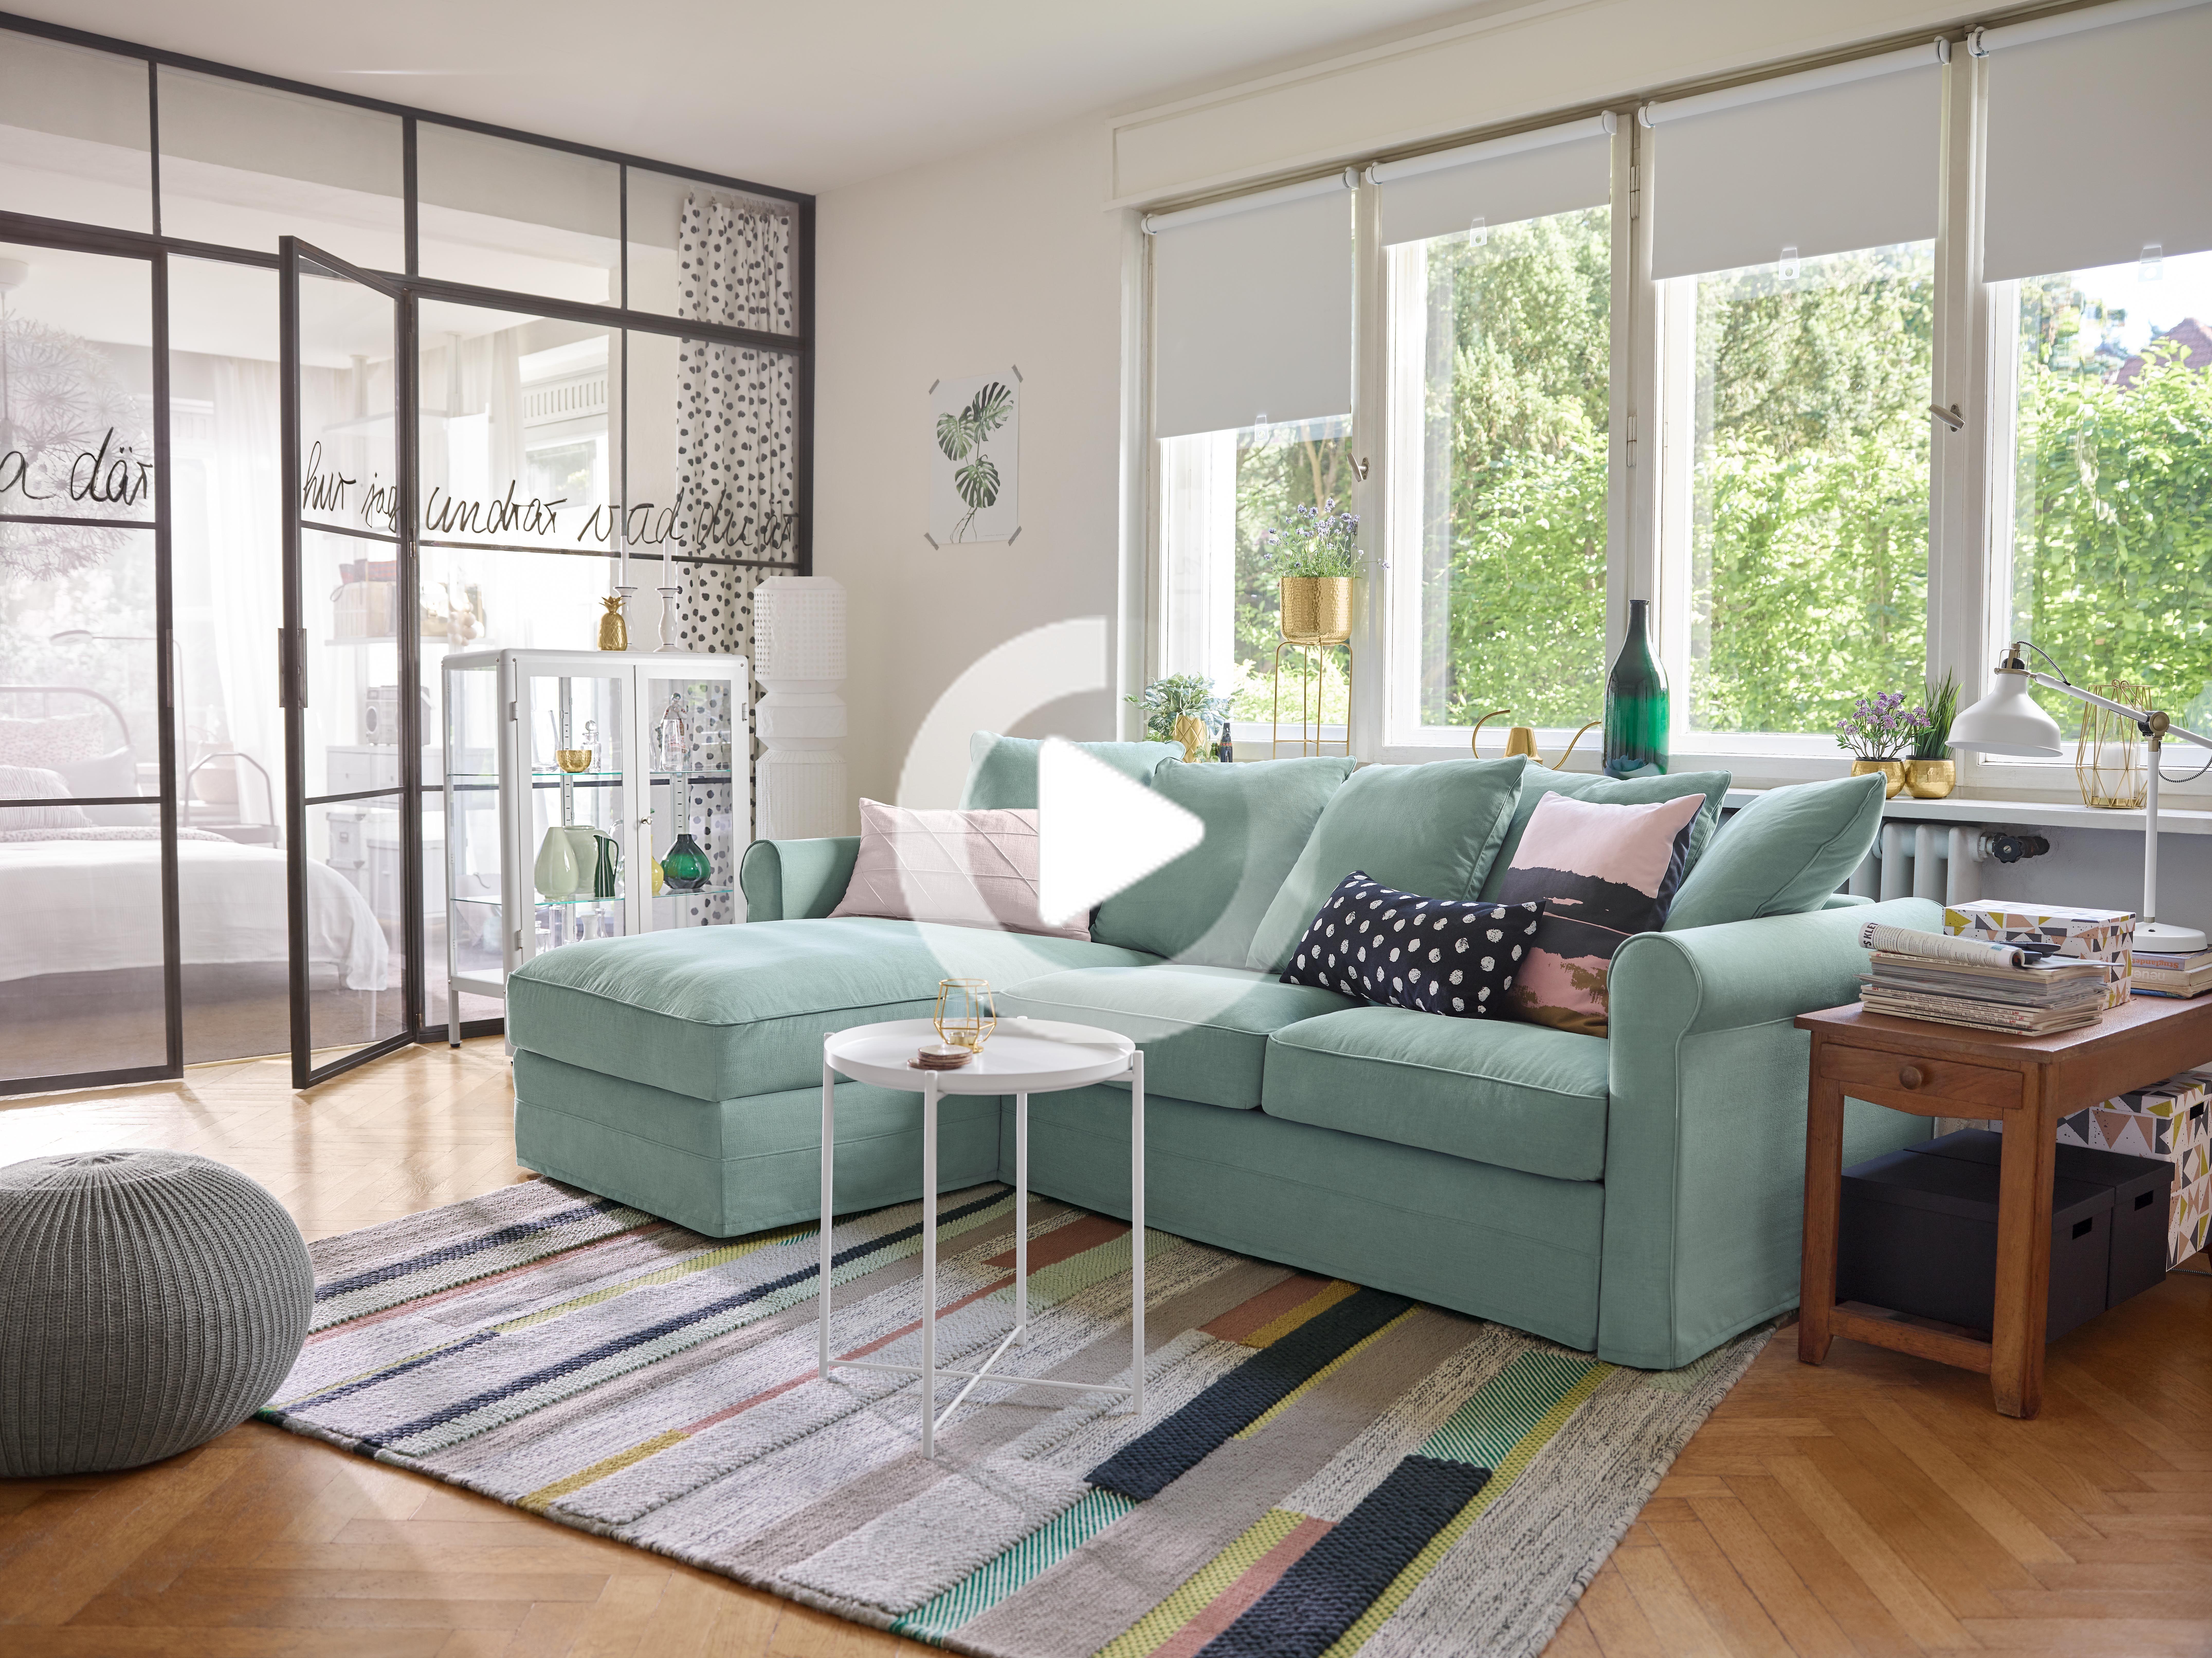 Nockeby 3er Sofa Mit Recamiere Links Tallmyra Tallmyra Verchromt Weiss Schwarz Verchromt Ikea Deutschland Ikea Living Room Ikea Nockeby Sofa Living Room Seating